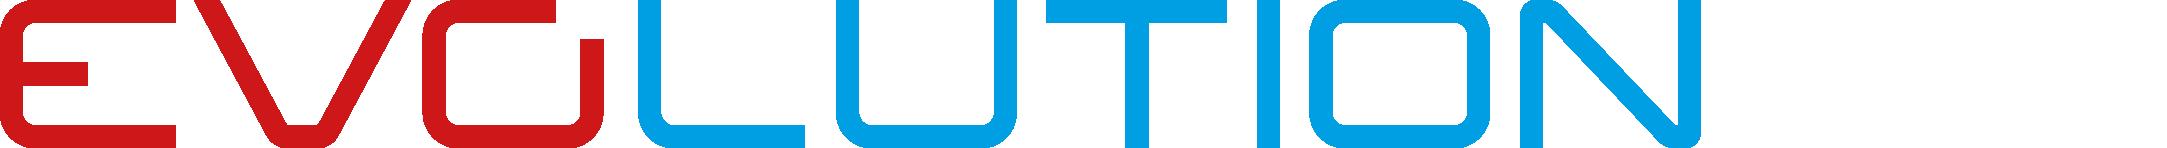 EVOLUTION Serie | MATTHES Maschinen-Industrietechnik GmbH Logo